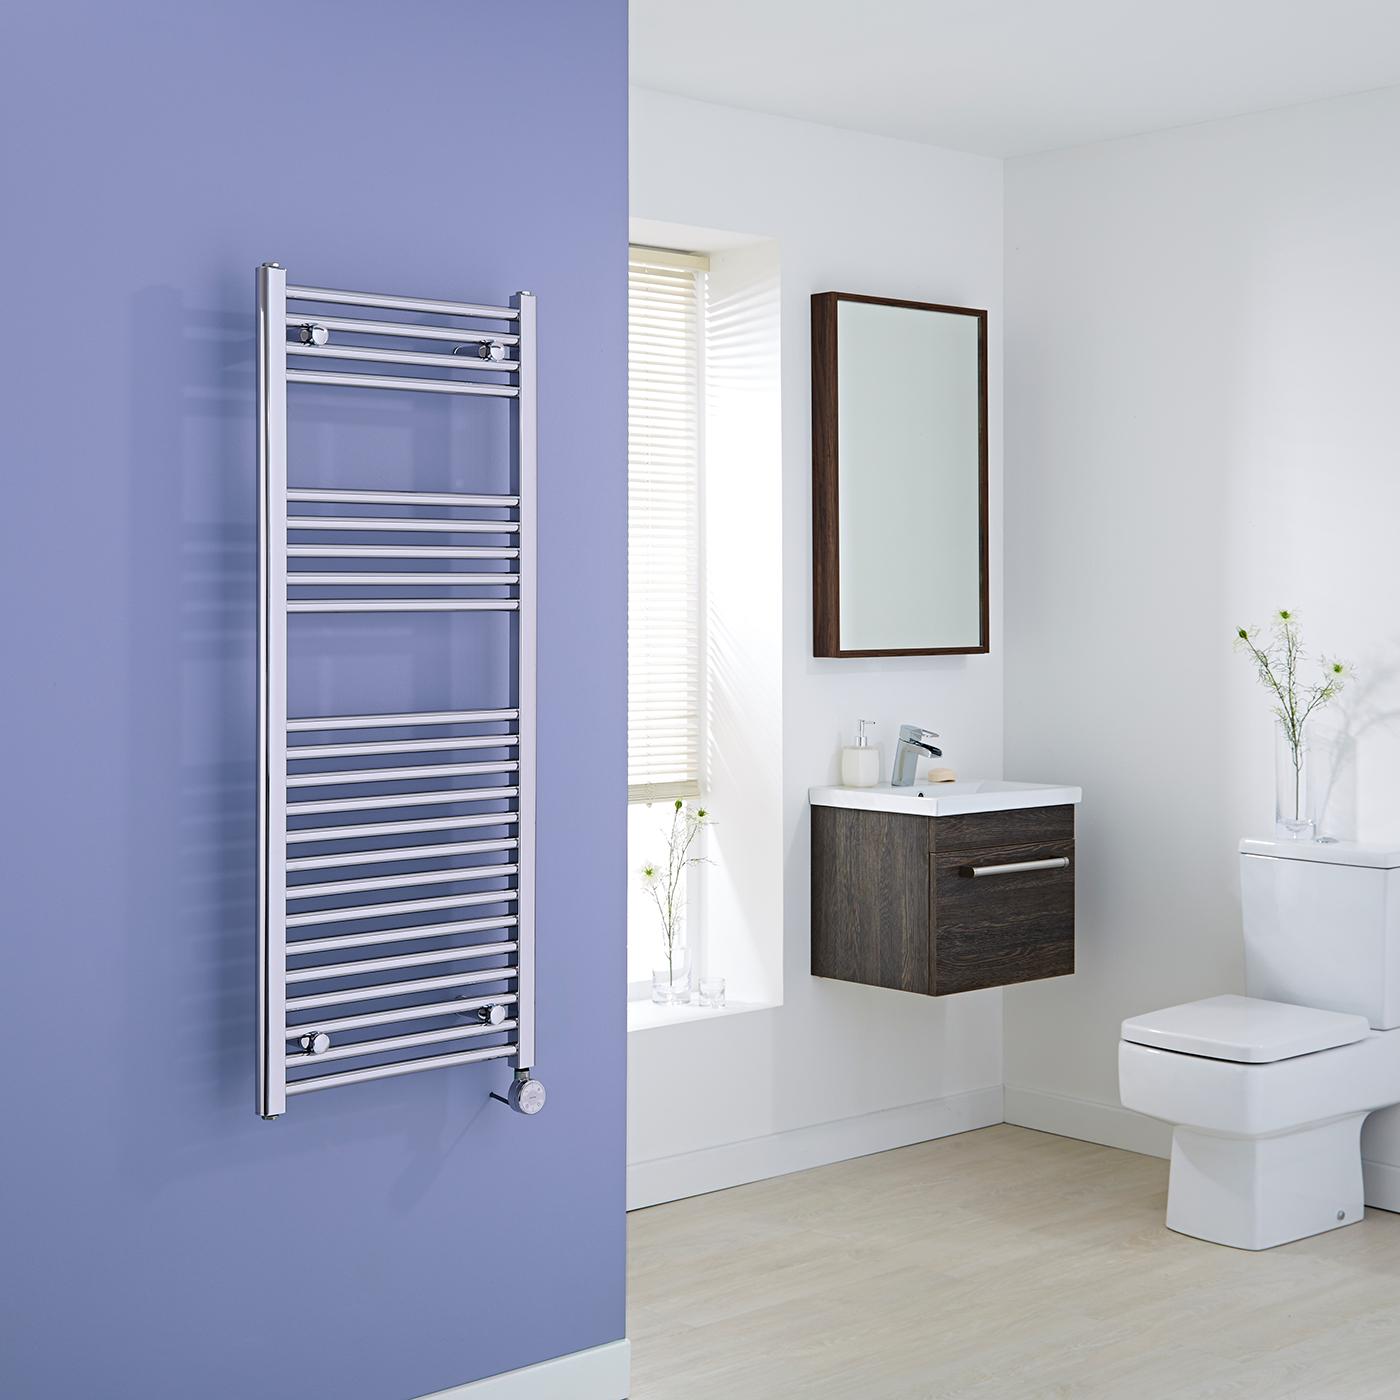 Milano Ribble Electric - Chrome Flat Heated Towel Rail - 1200mm x 500mm